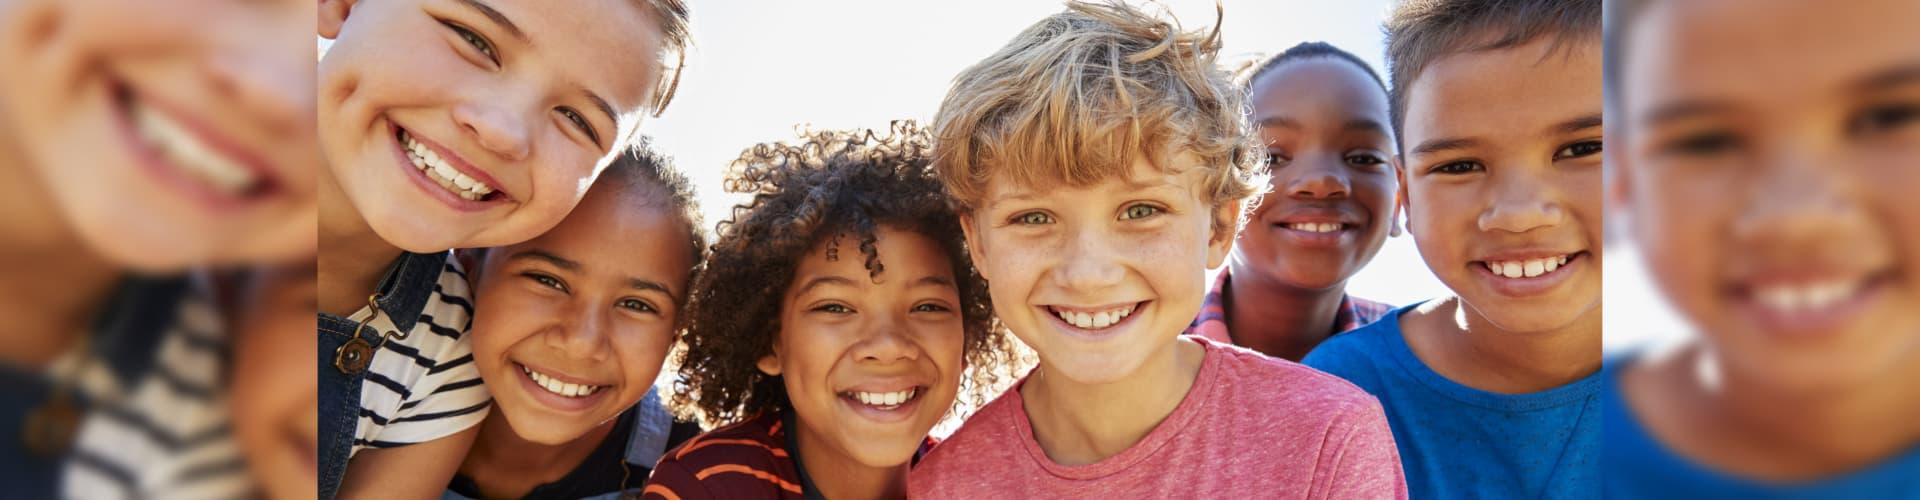 children smiling on camera